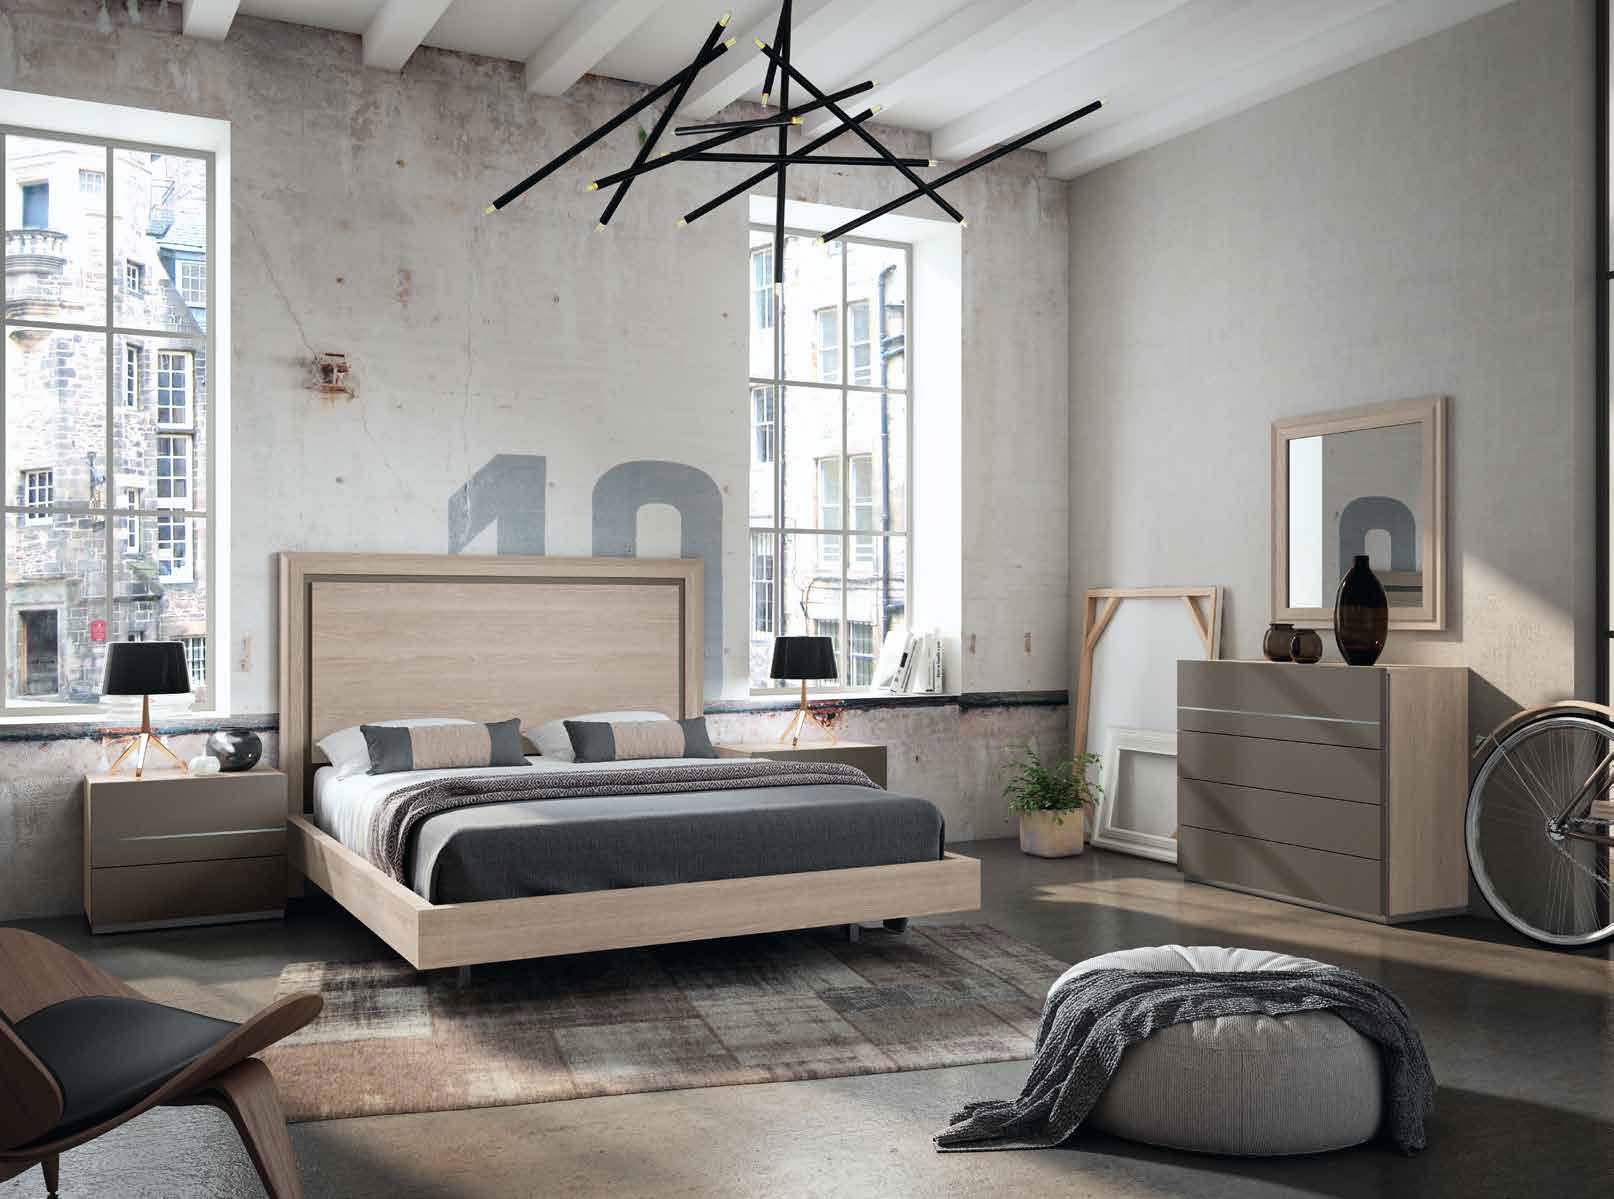 creta-dormitorio-aura-41